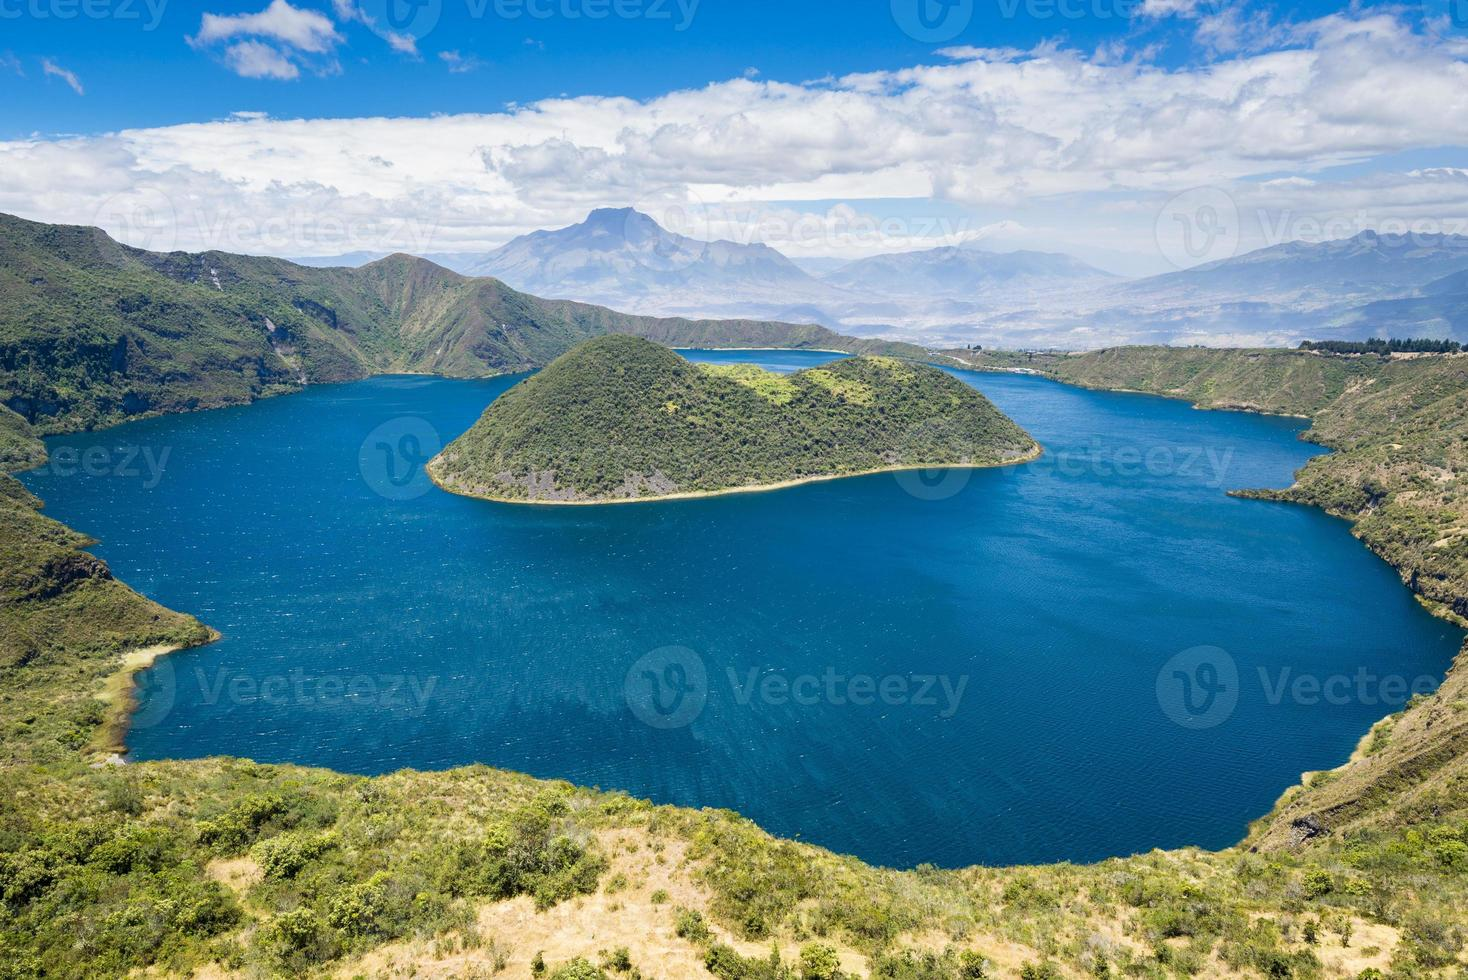 cuicocha kratermeer, reserve cotacachi-cayapas, ecuador foto